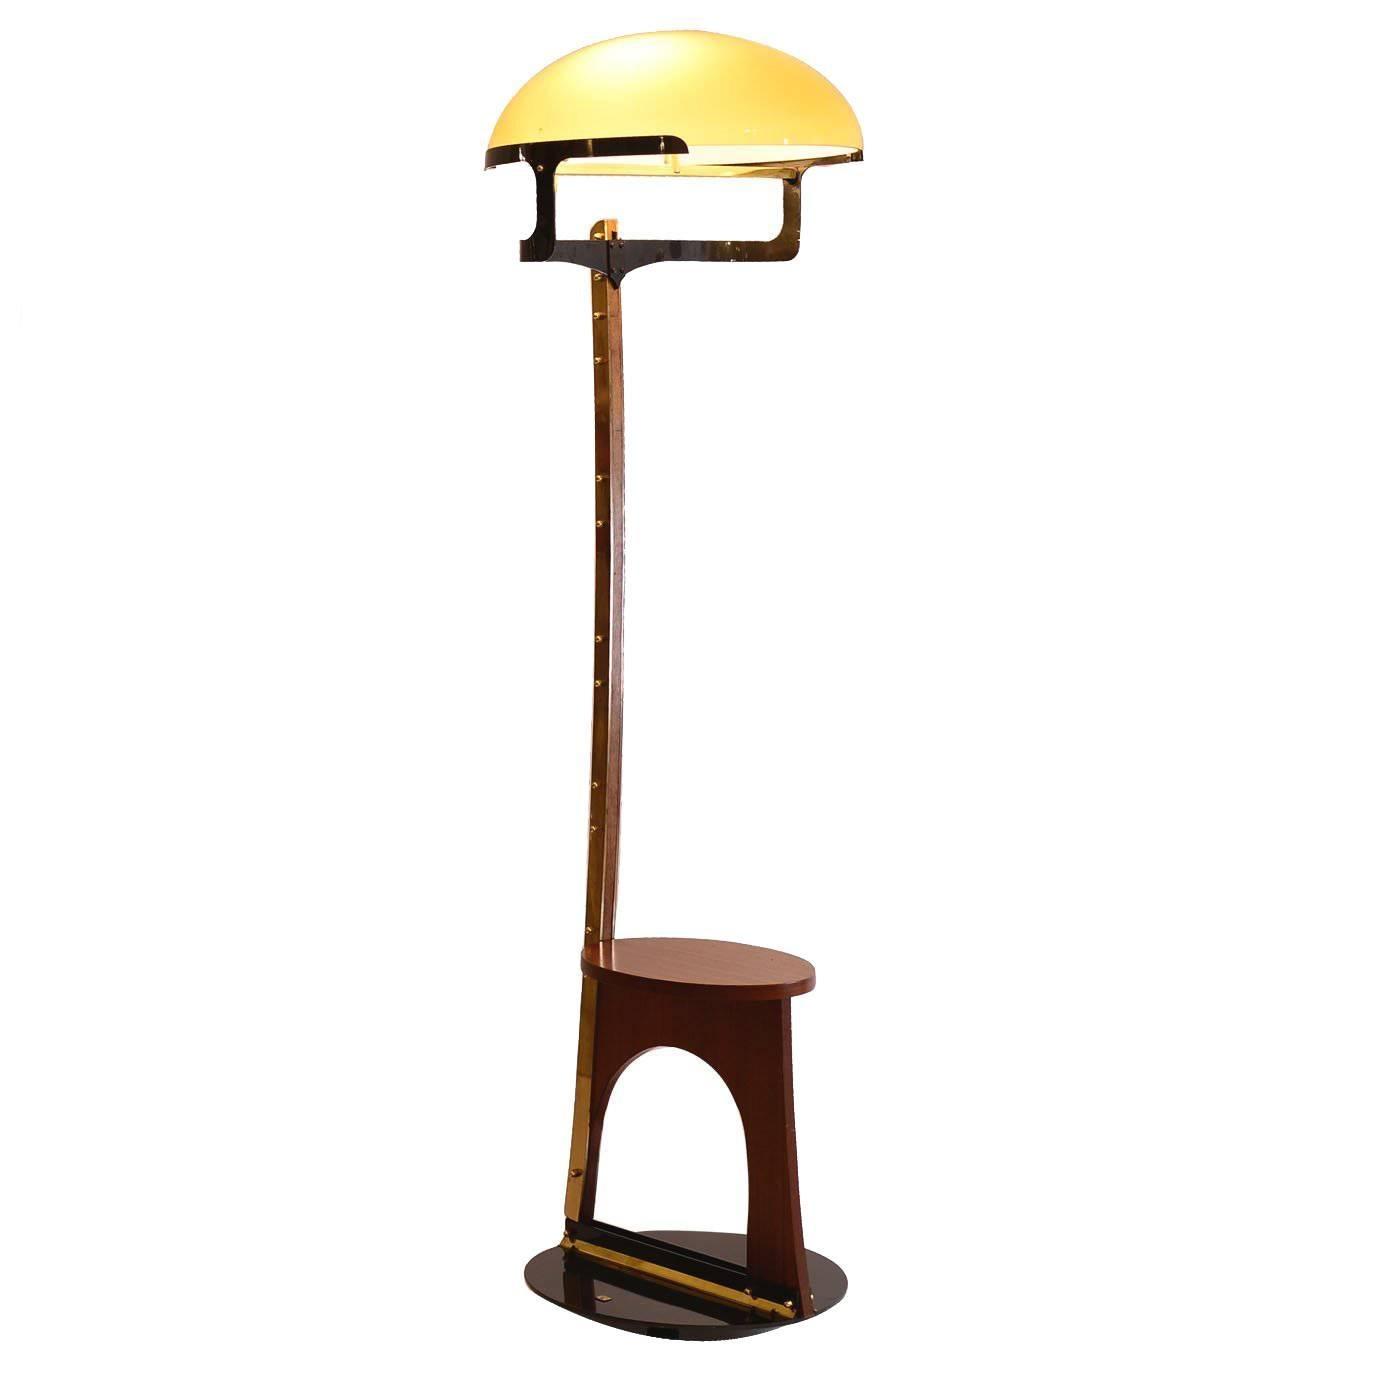 Original Luigi Blau Vienna 1989 Modern Floor Lamp Woka Art Collection